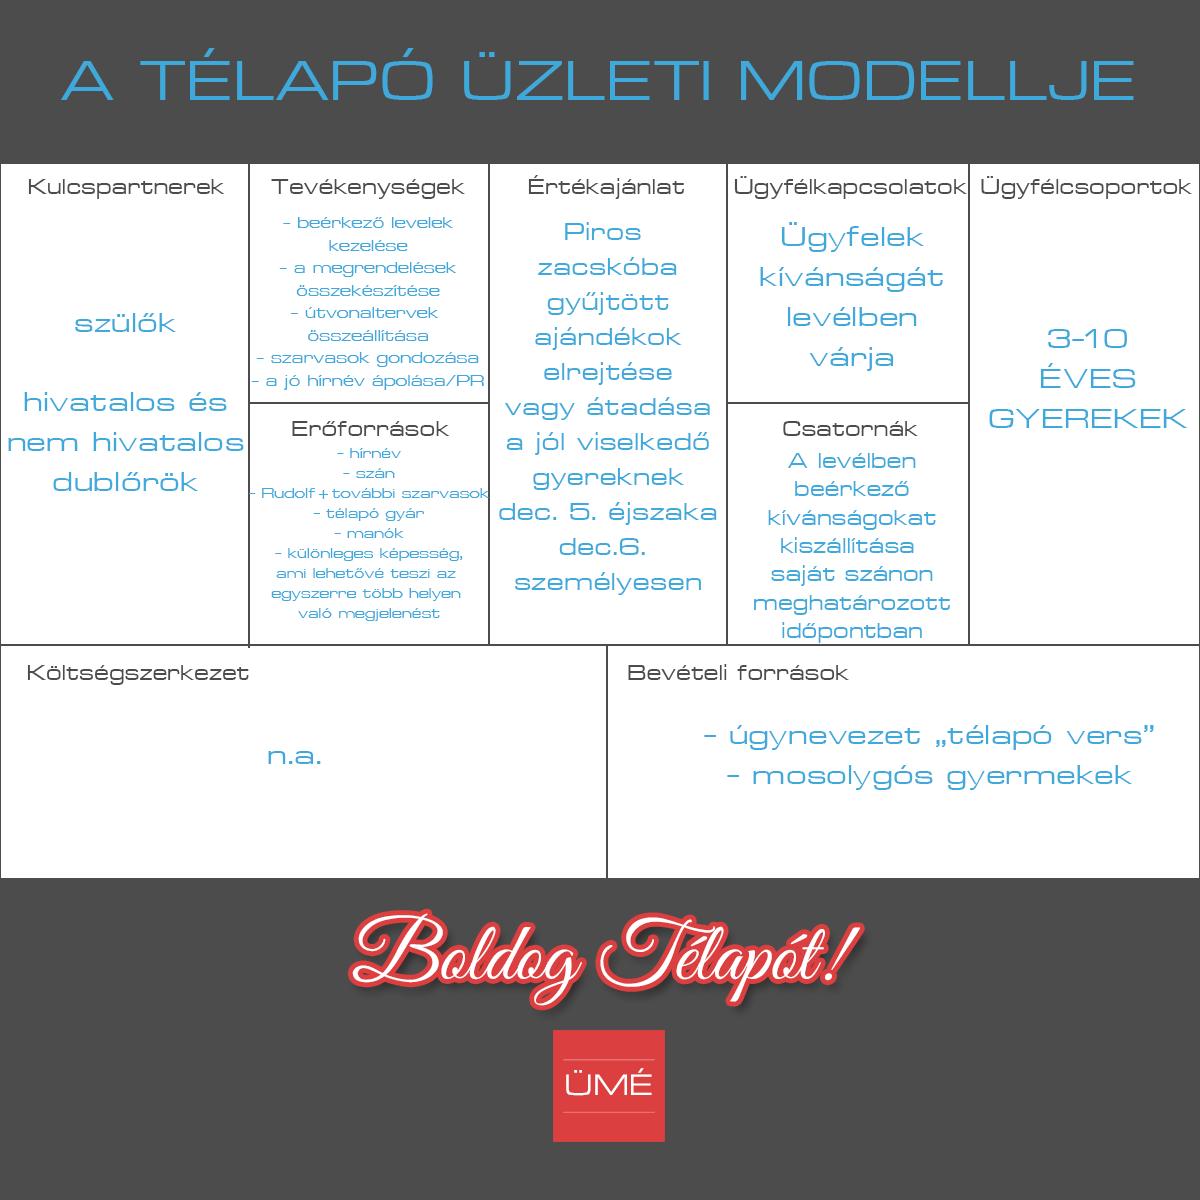 telapo_uzleti_modellje2016.png